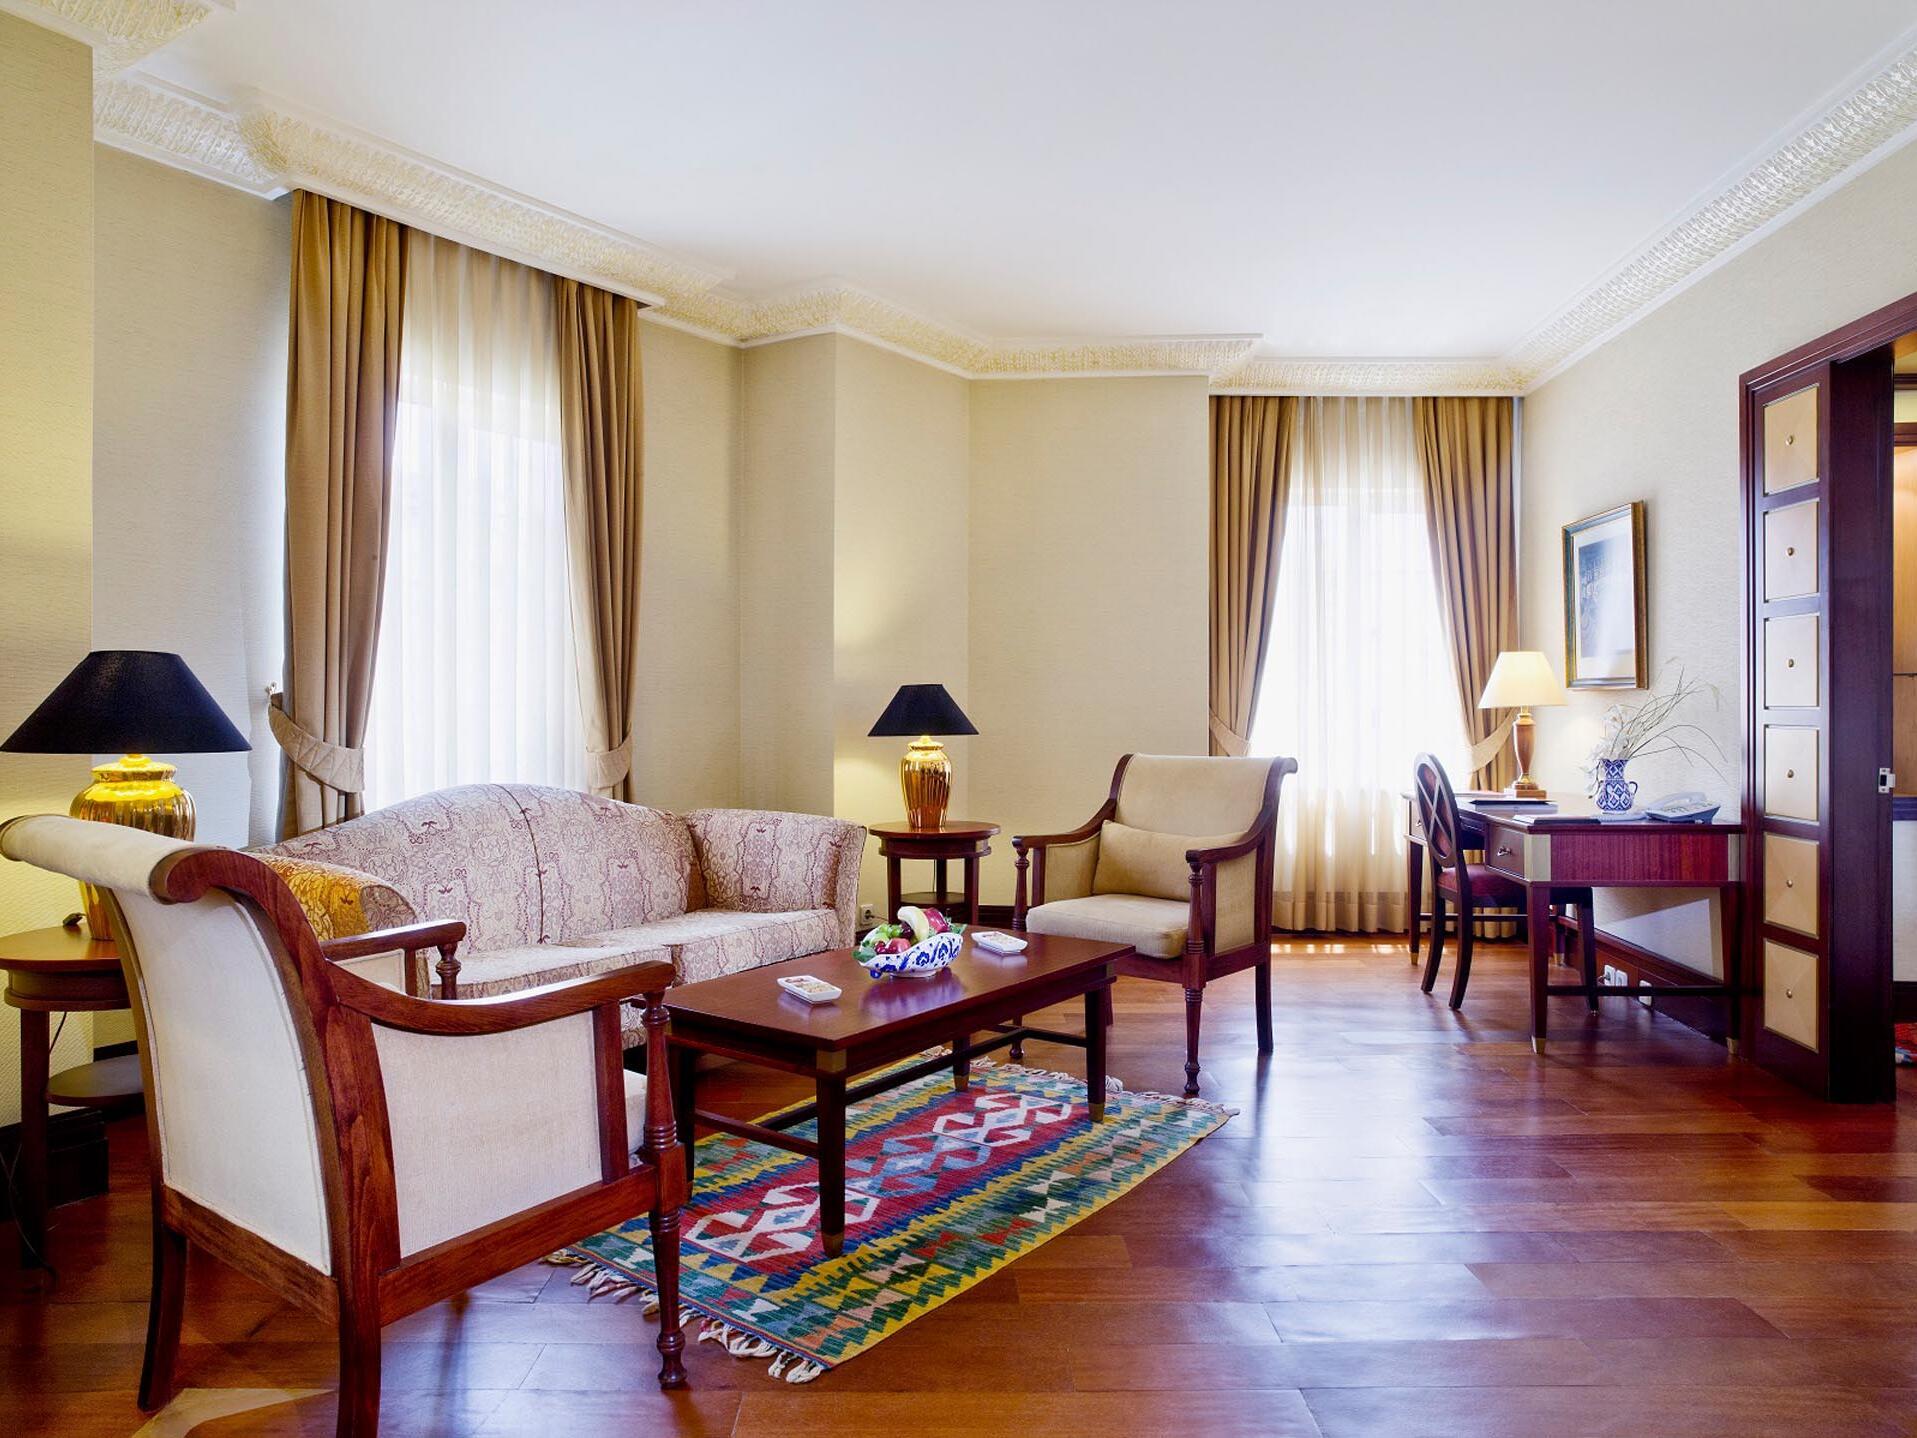 Family Suite Eresin hotels sultanahmet